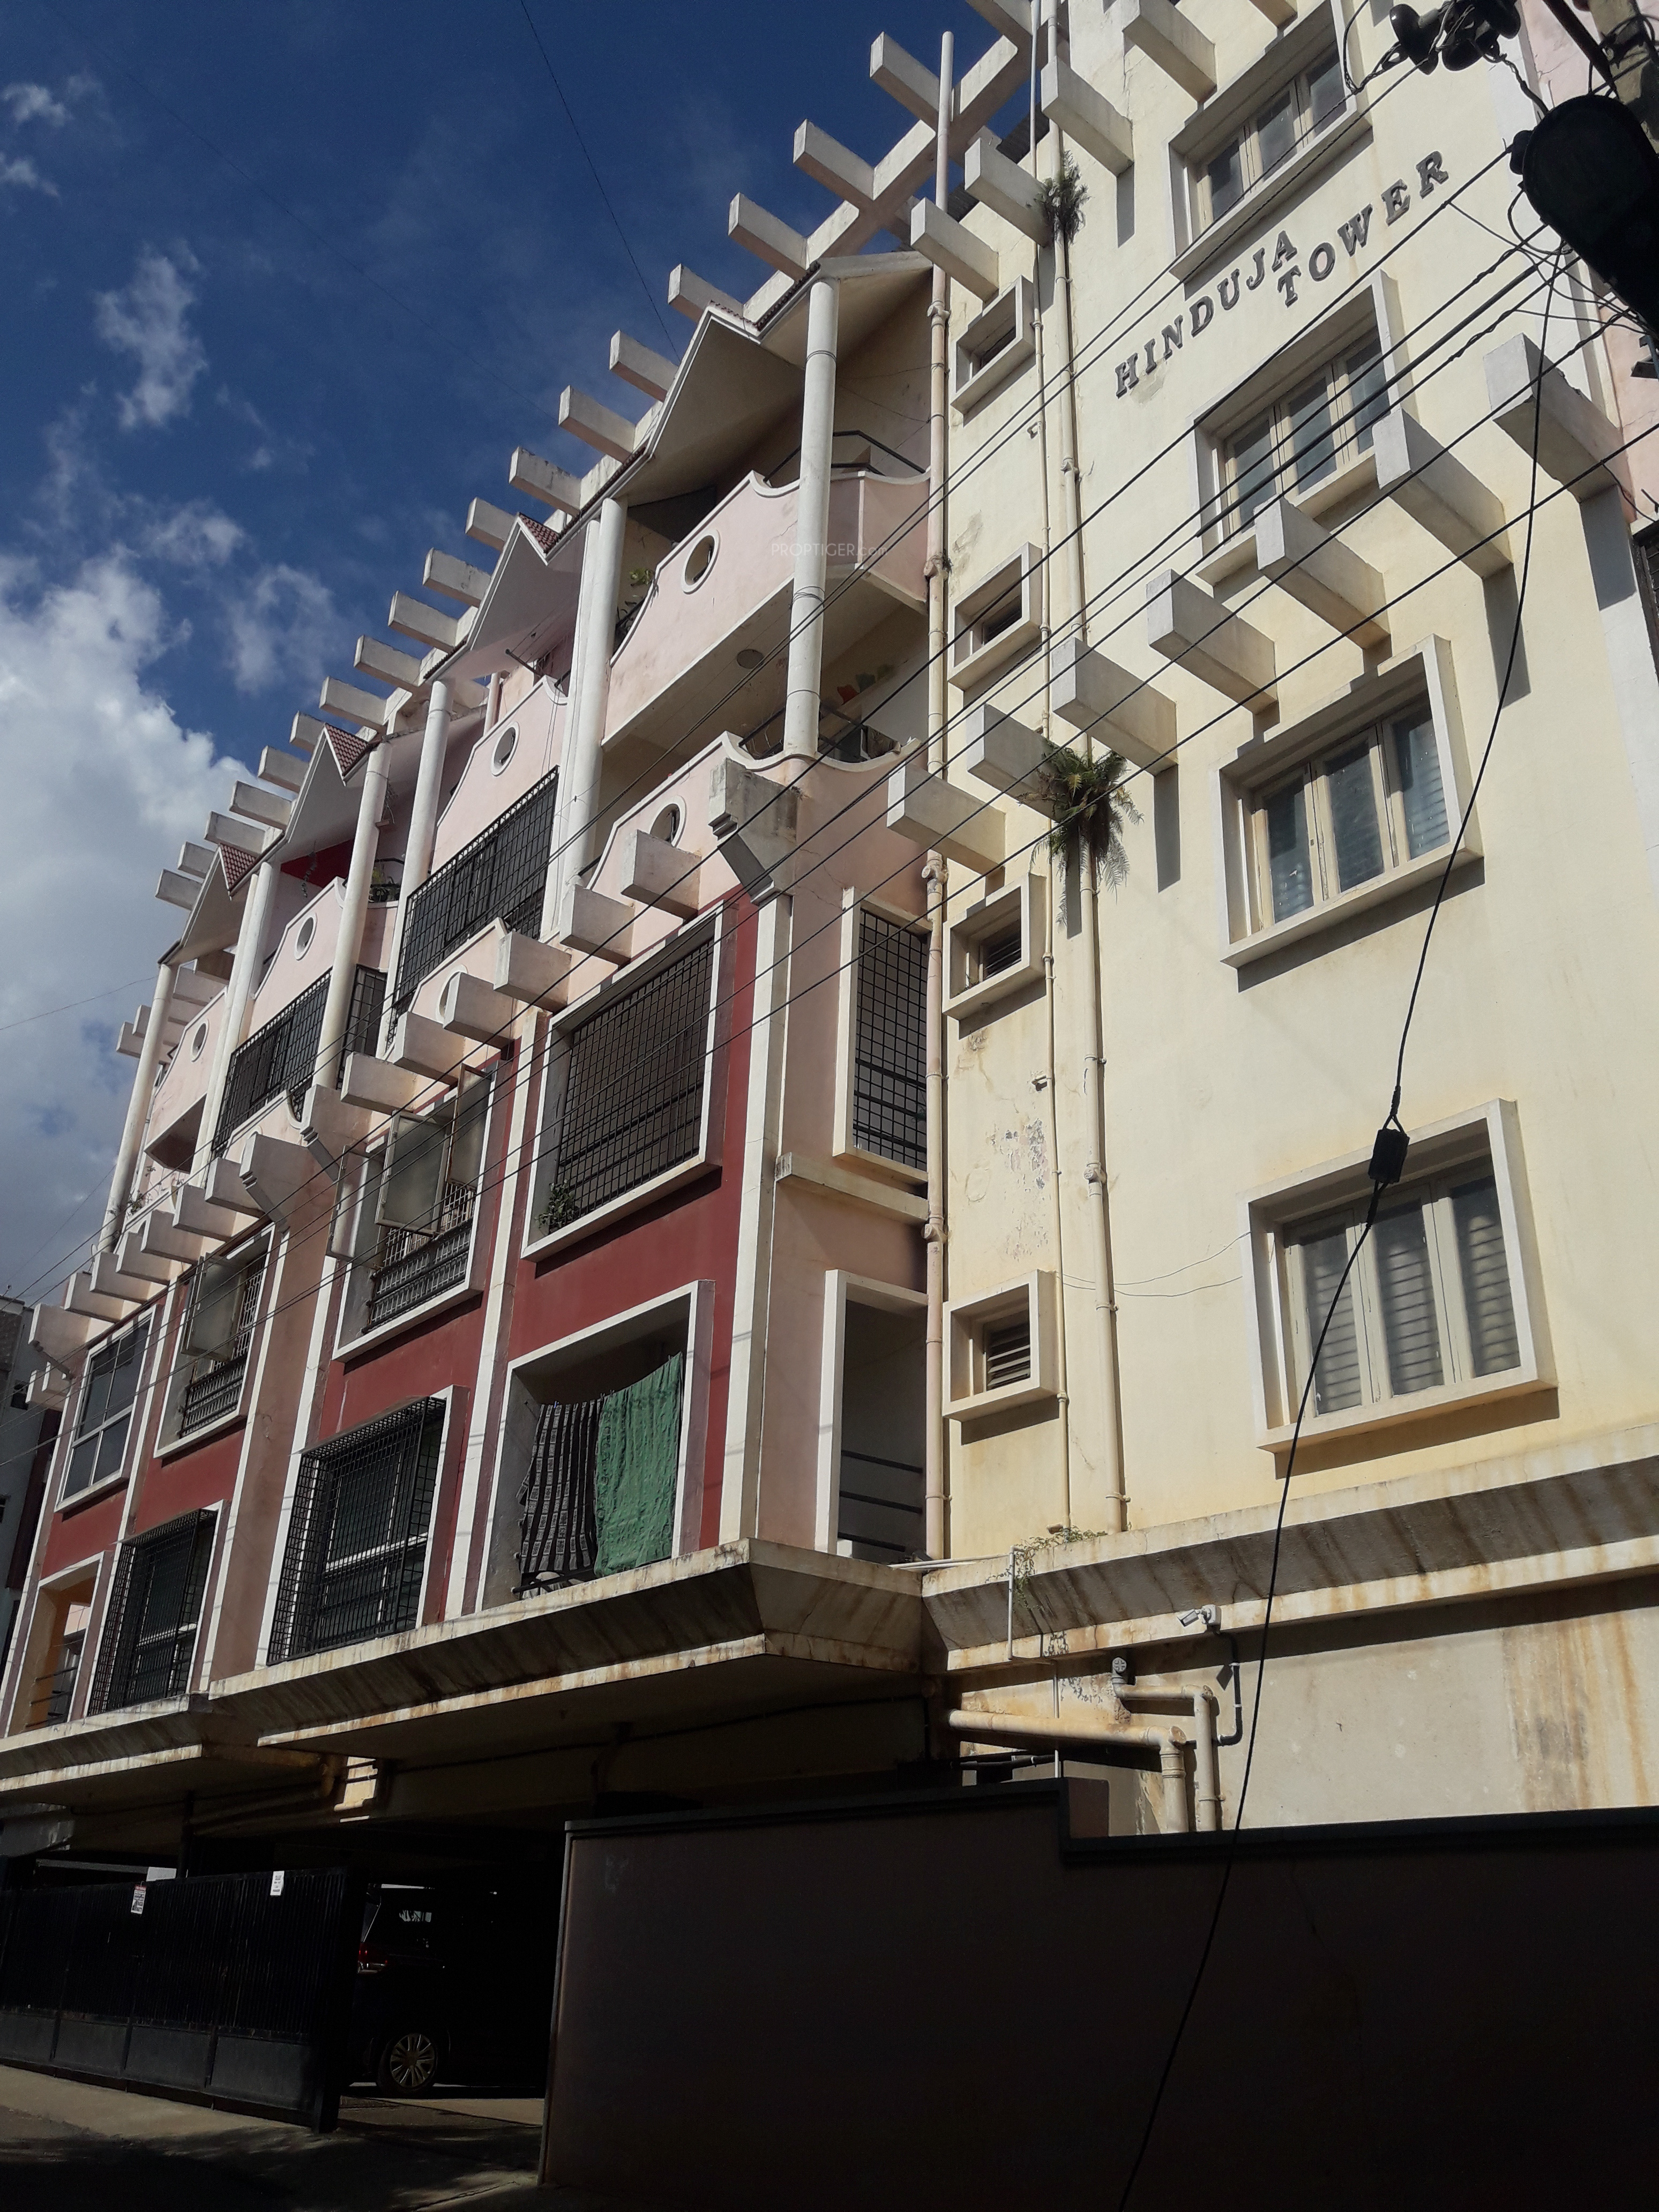 KVS Hinduja Towers in Kodigehalli, Bangalore - Price